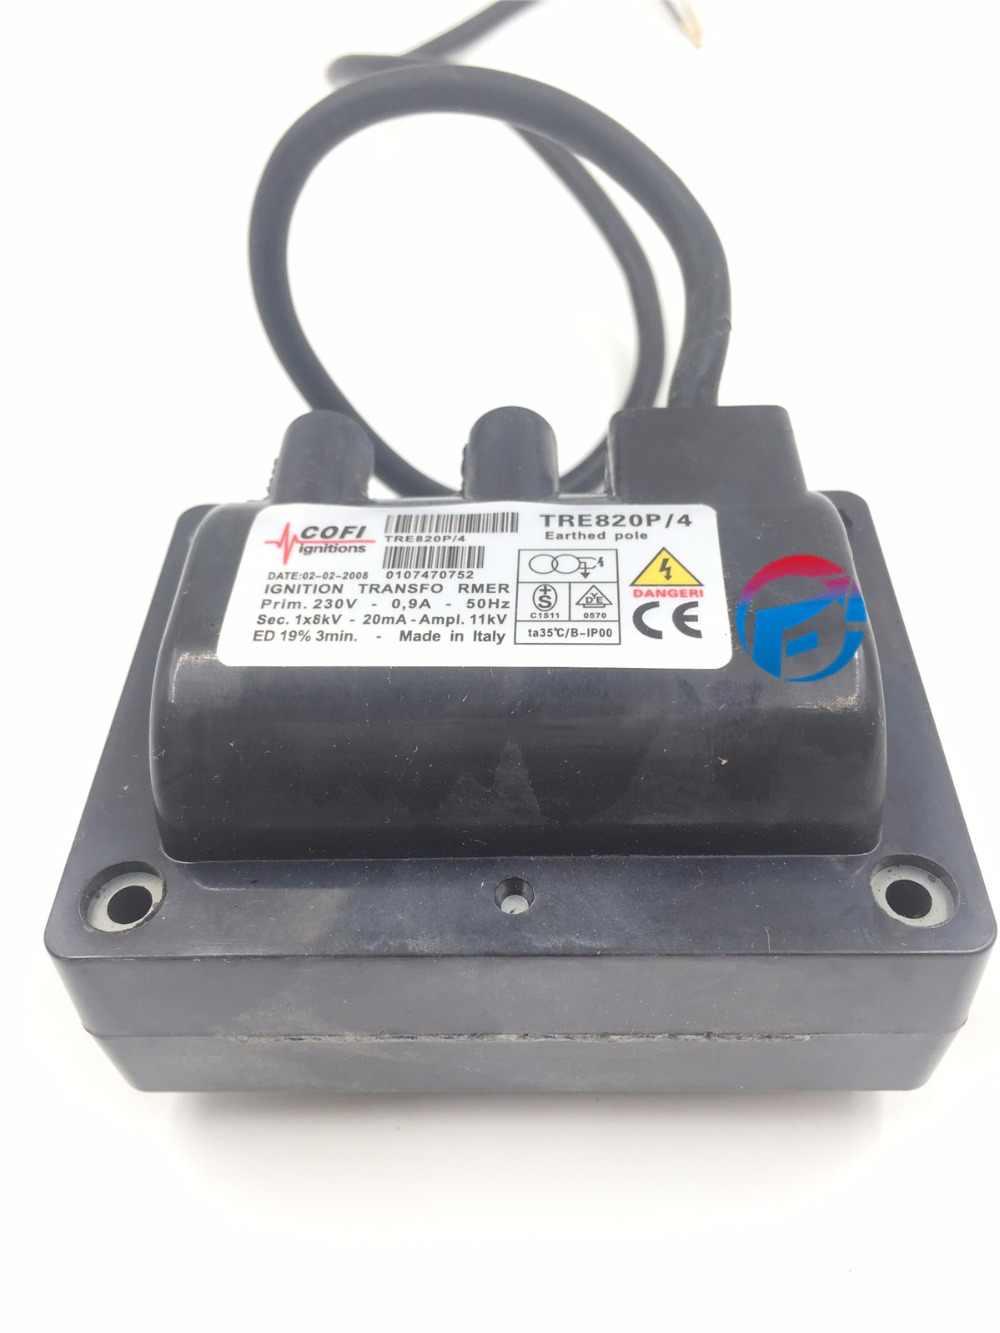 COFI IGNITIONS TRE820 230V ELECTRONIC IGNITION TRANSFORMER